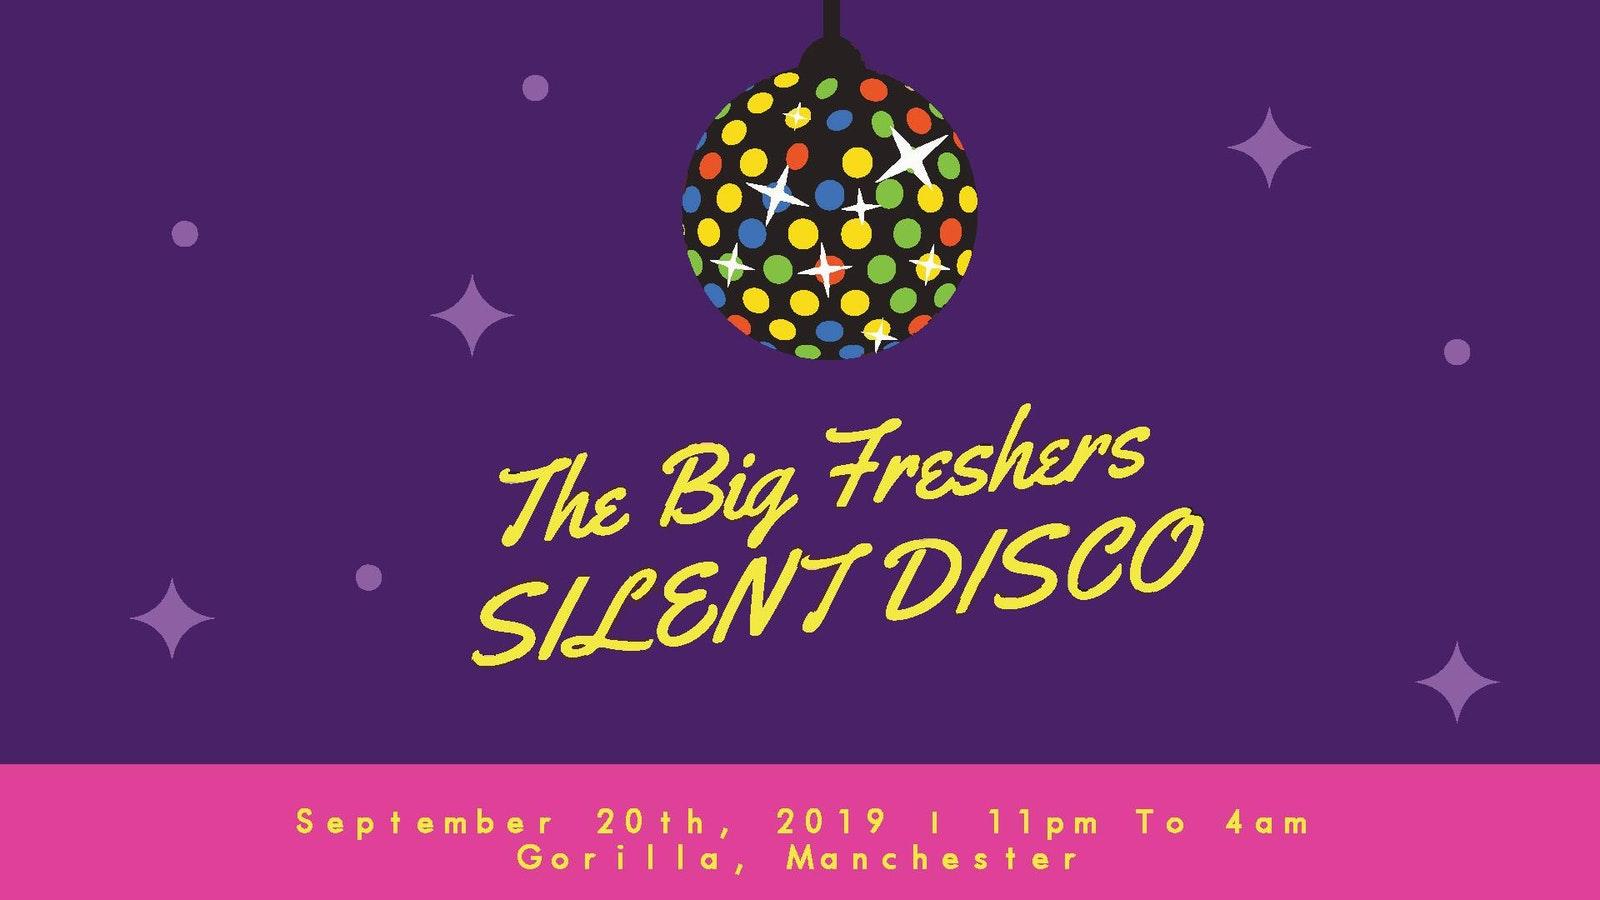 The Big Freshers Silent Disco